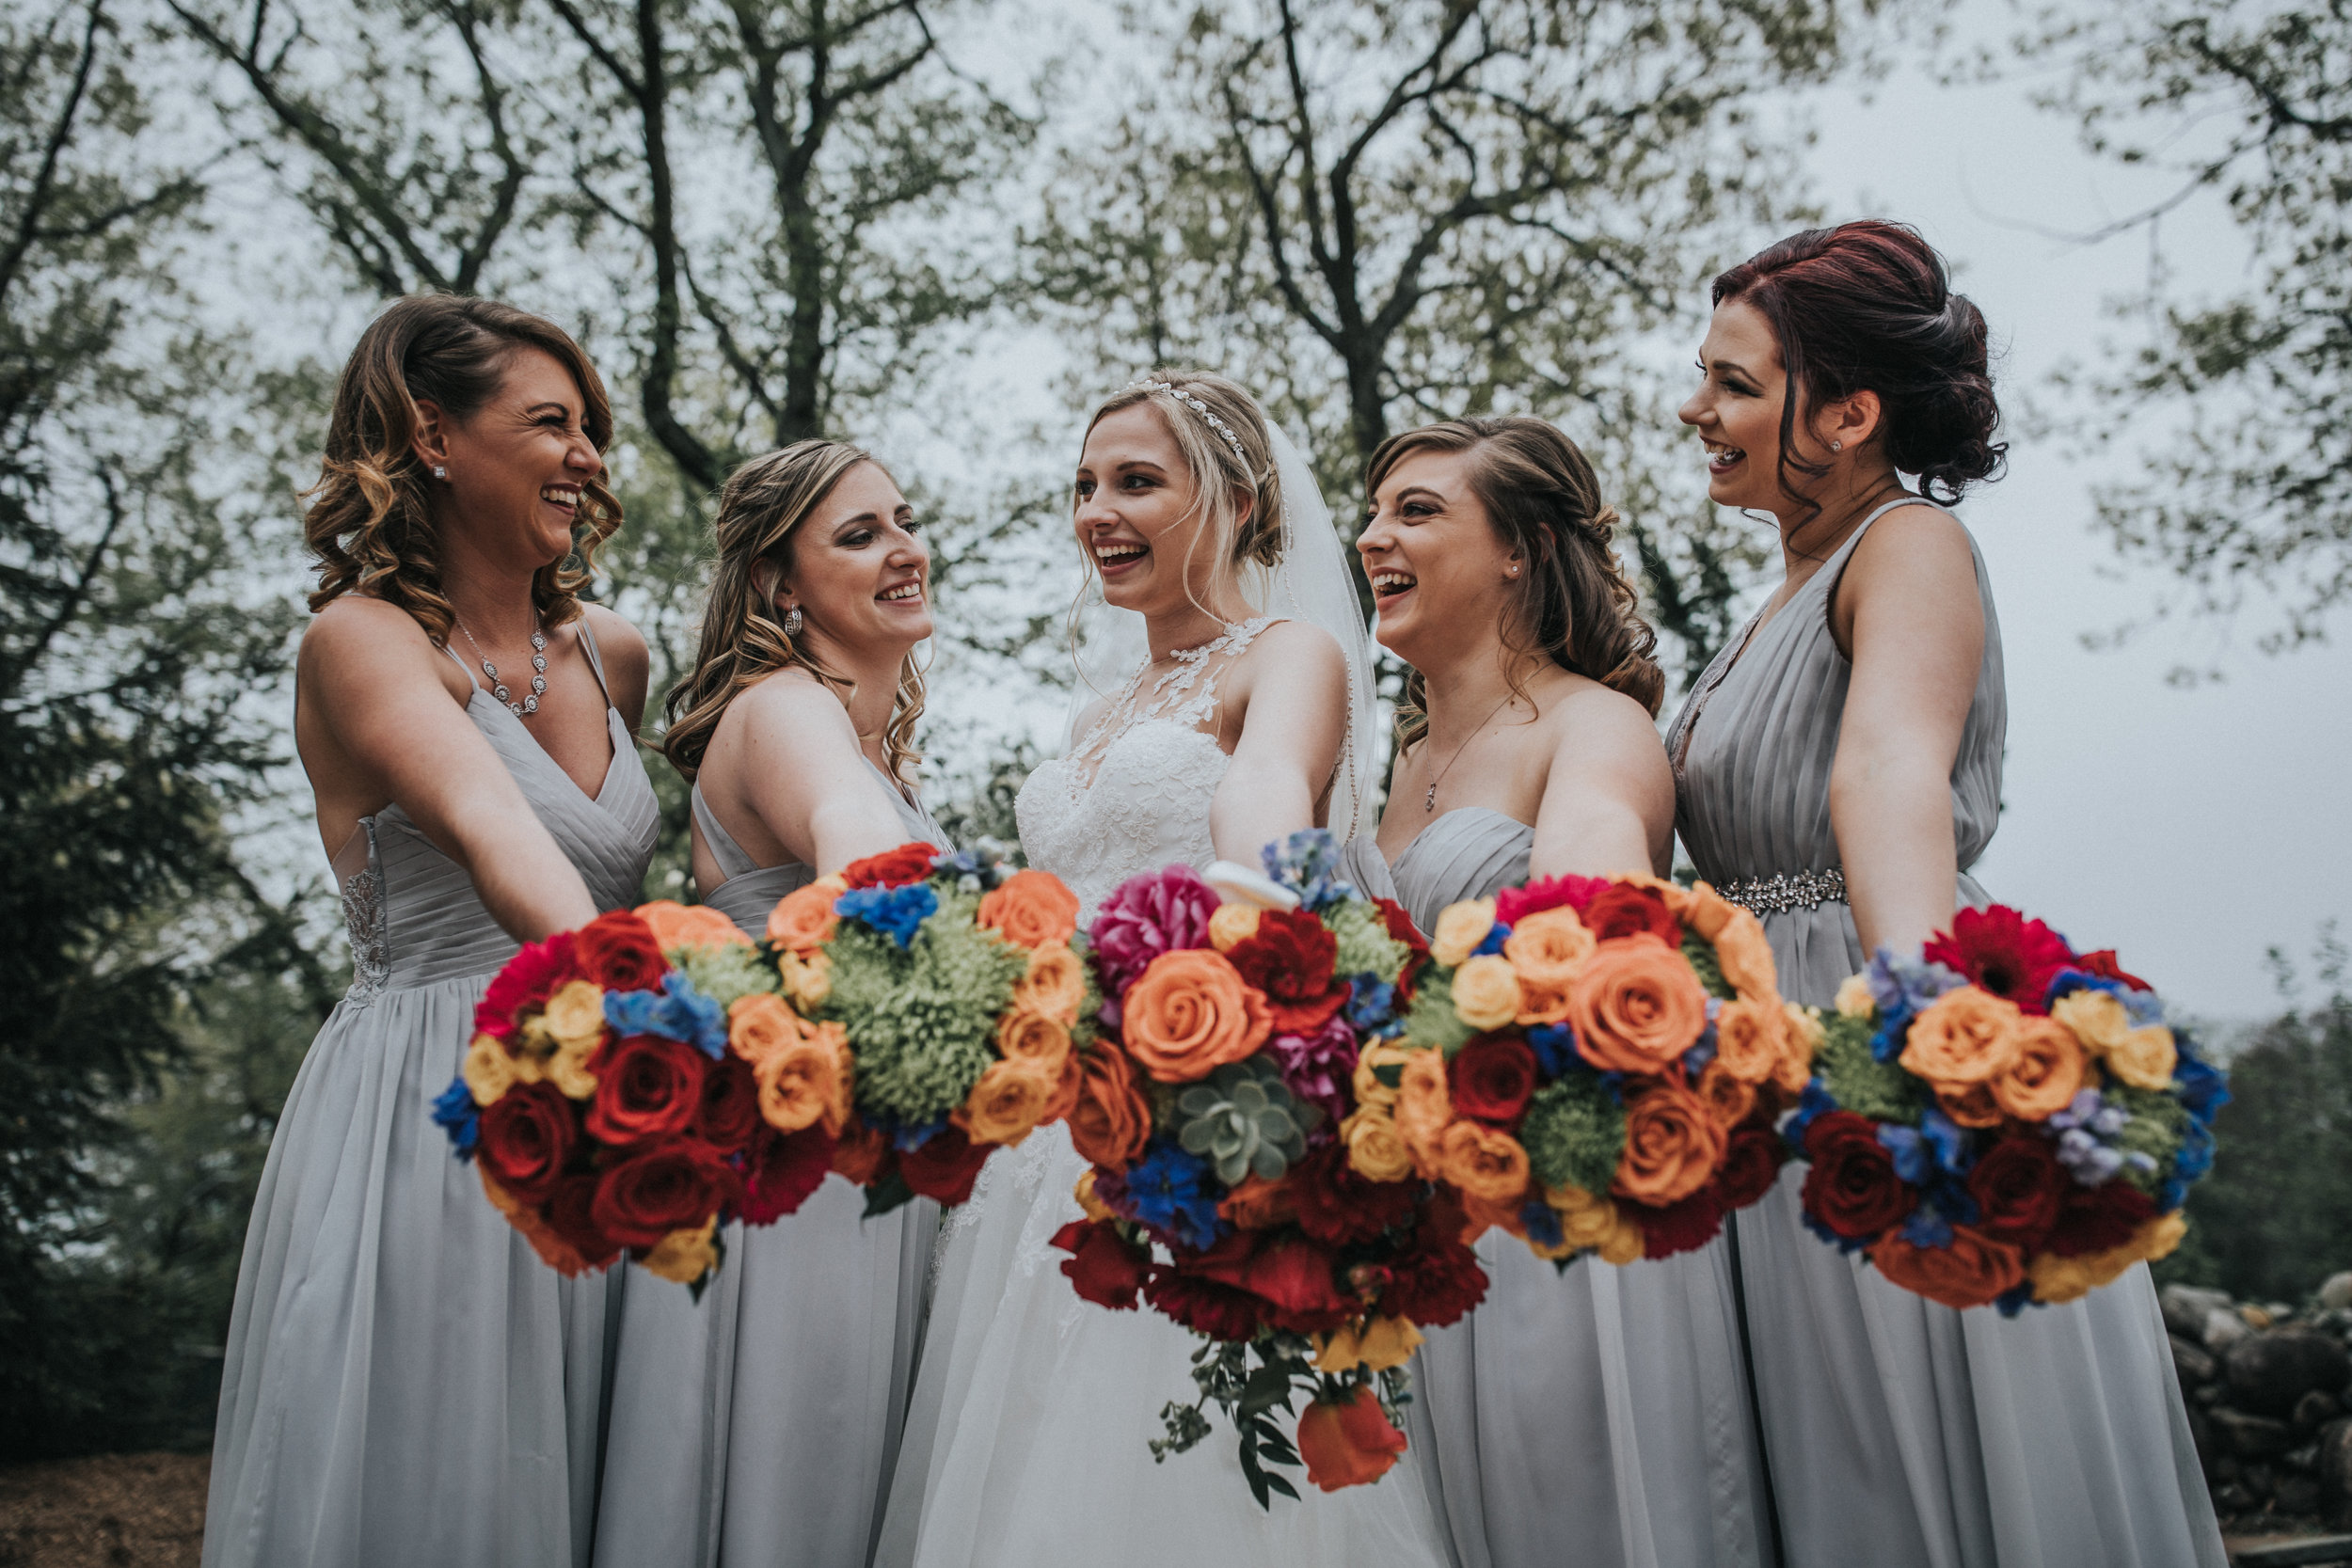 New-Jersey-Wedding-Photographer-Megan&Nick-BridalParty-33.jpg